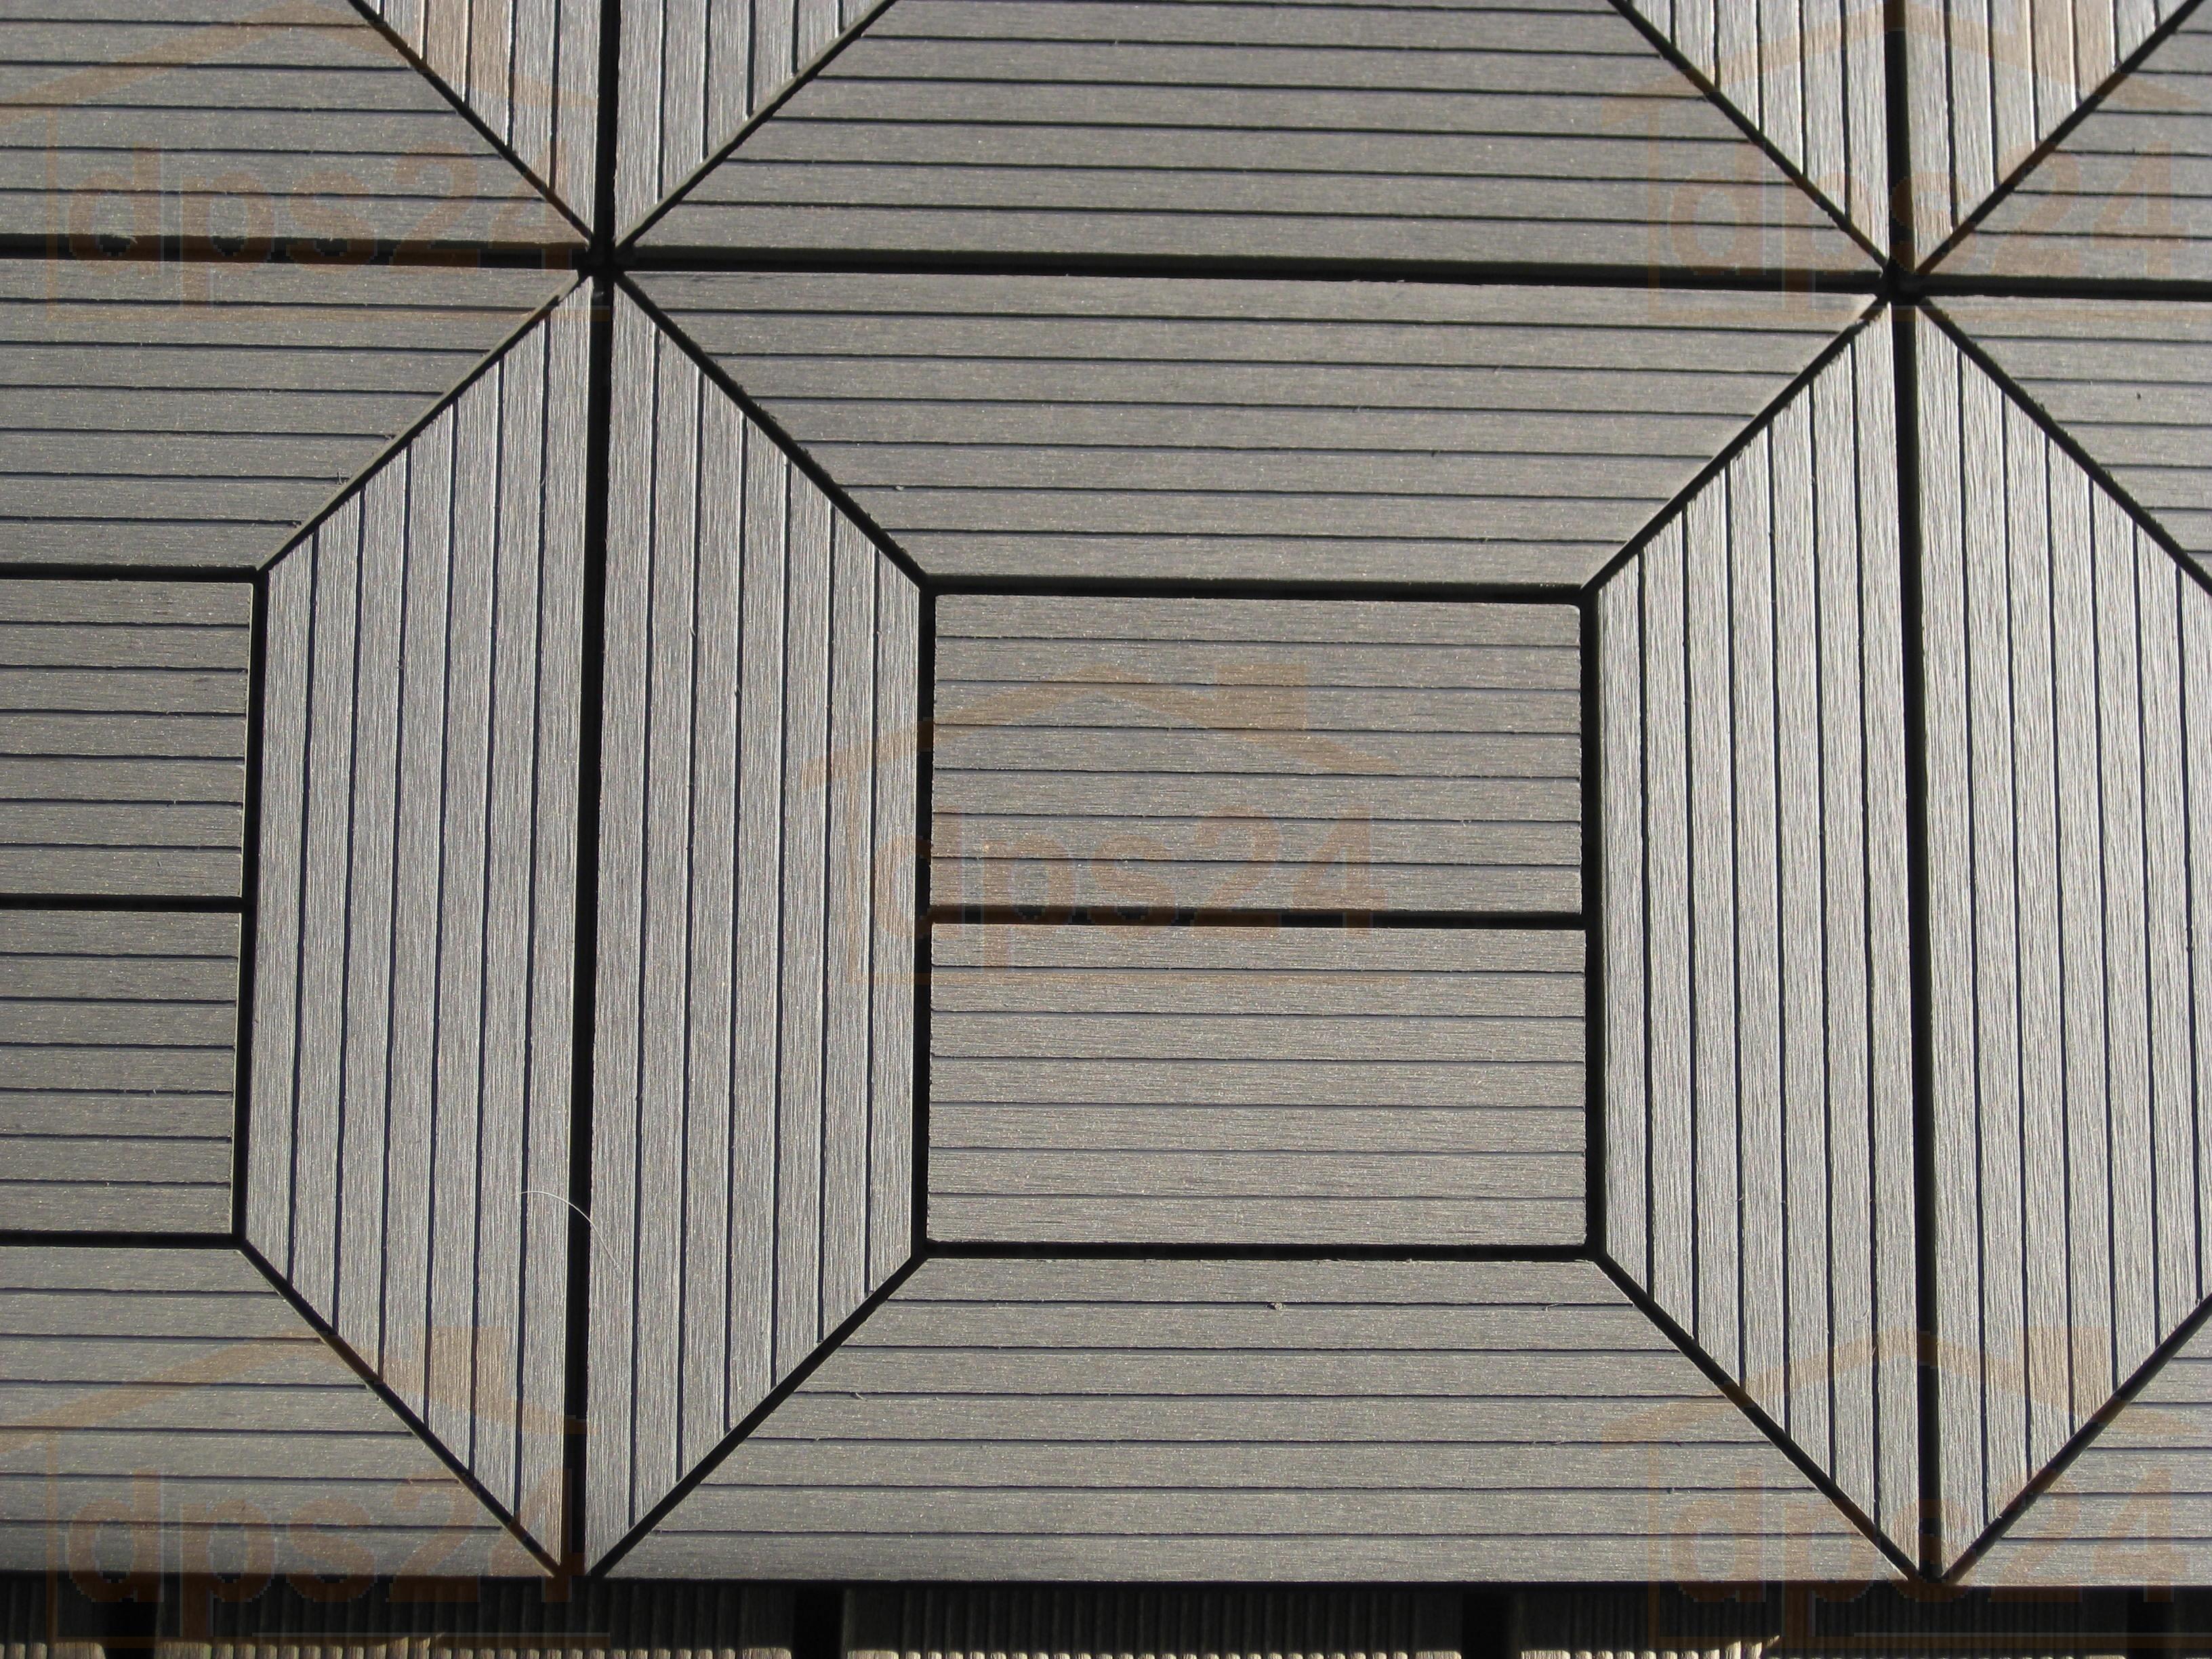 Holzfliese WPC-Holz modulares Klicksystem